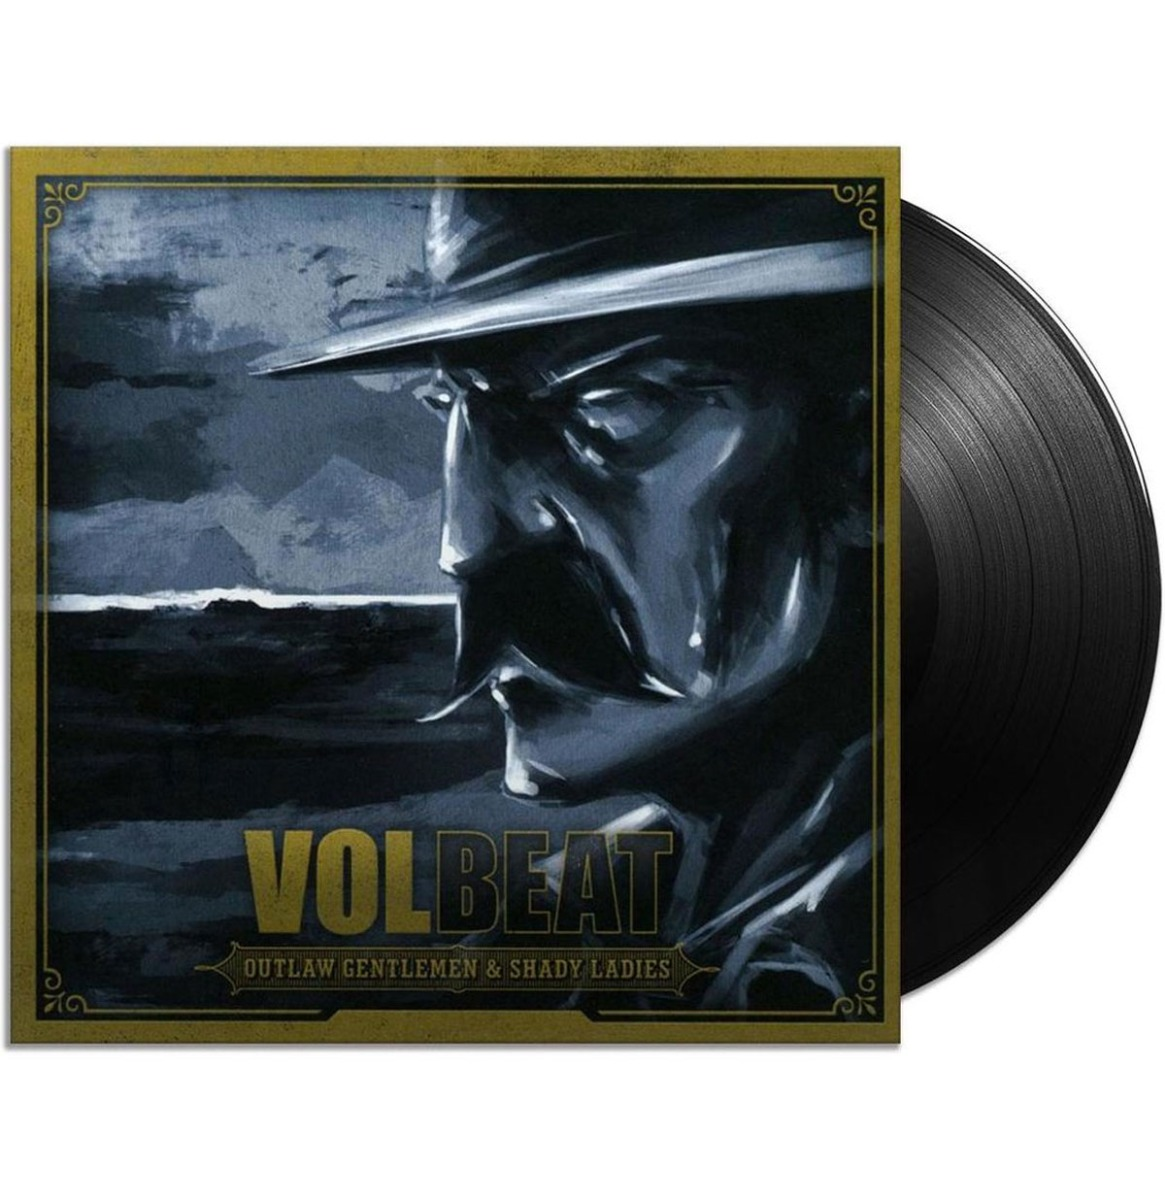 Volbeat - Outlaw Gentlemen & Shady Ladies 2LP + Bonus CD